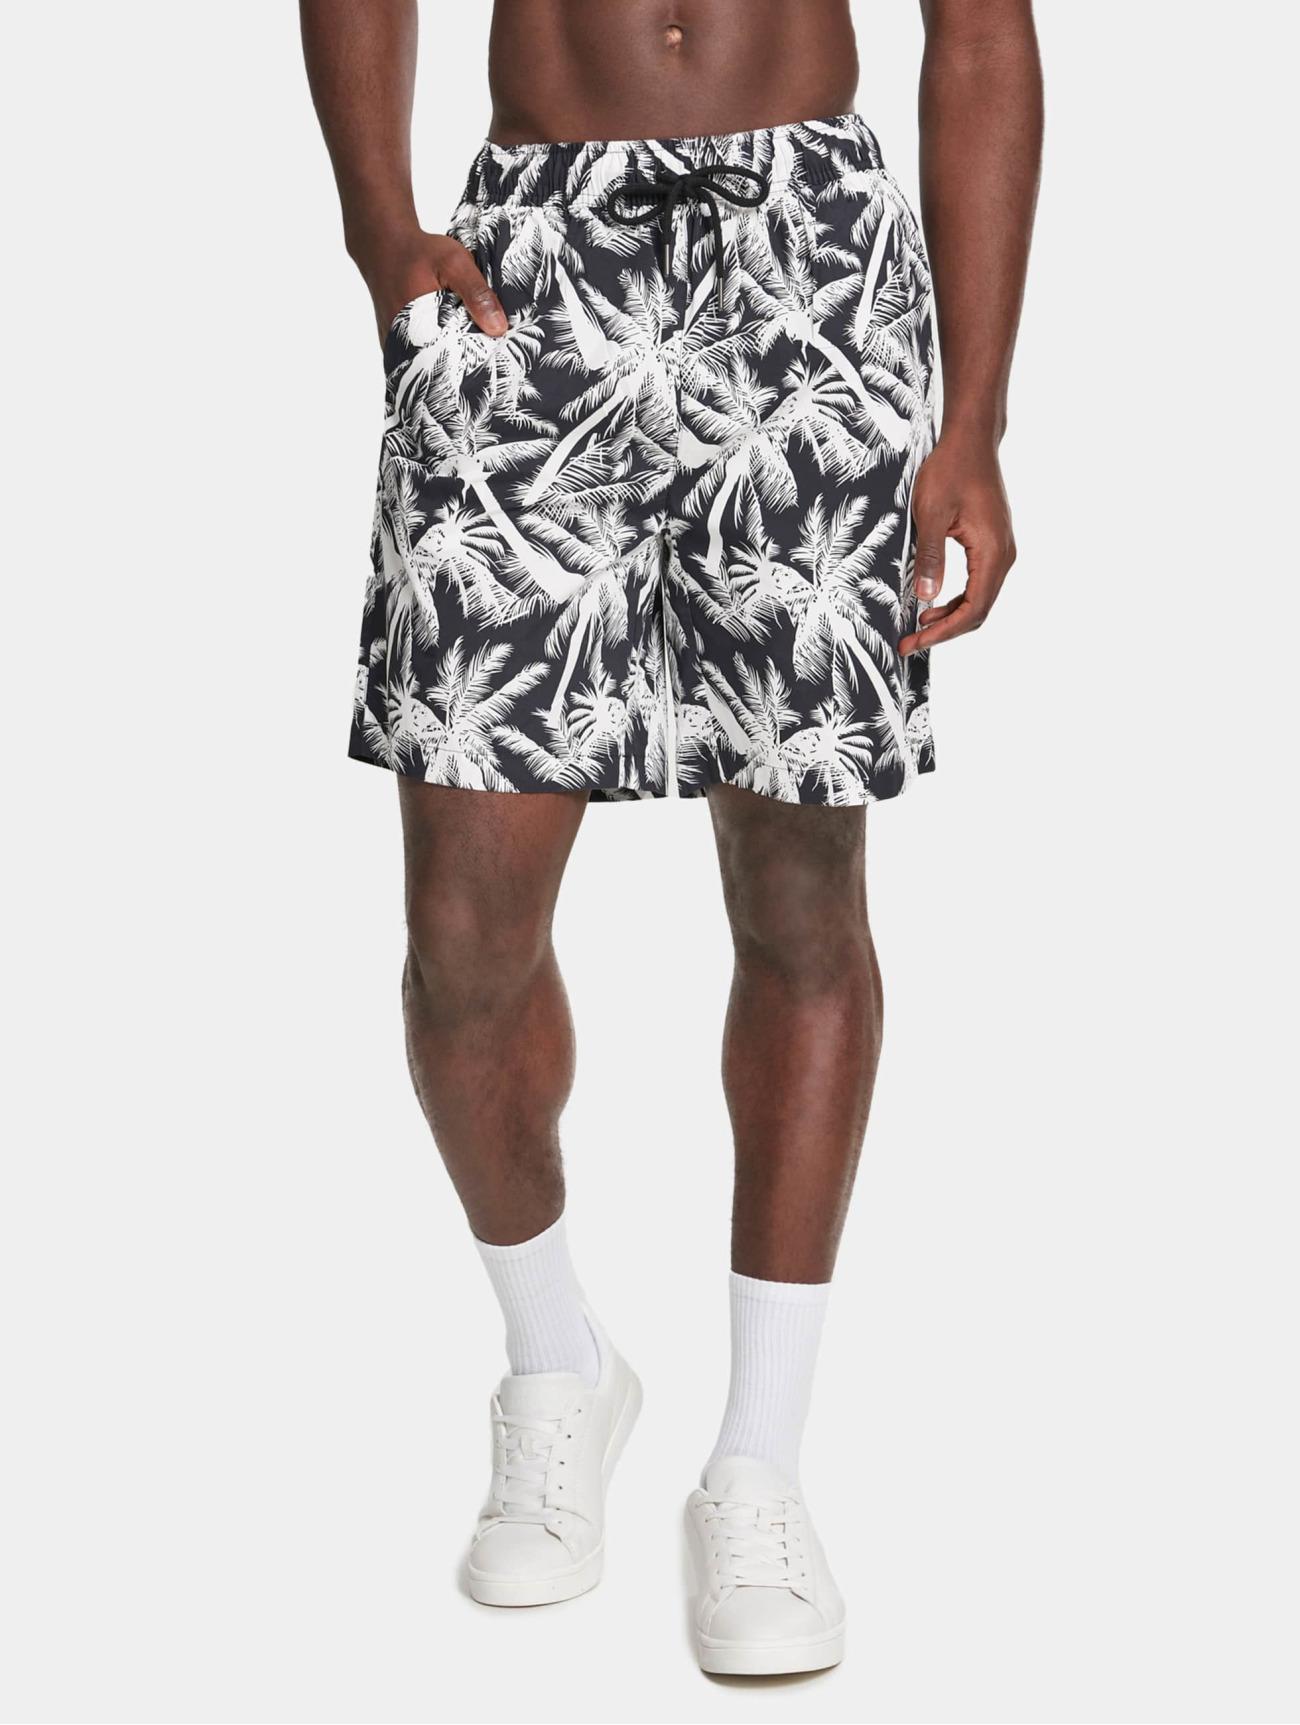 Urban Classics  Pattern Resort  noir Homme Short  636480 Homme Pantalons & Shorts